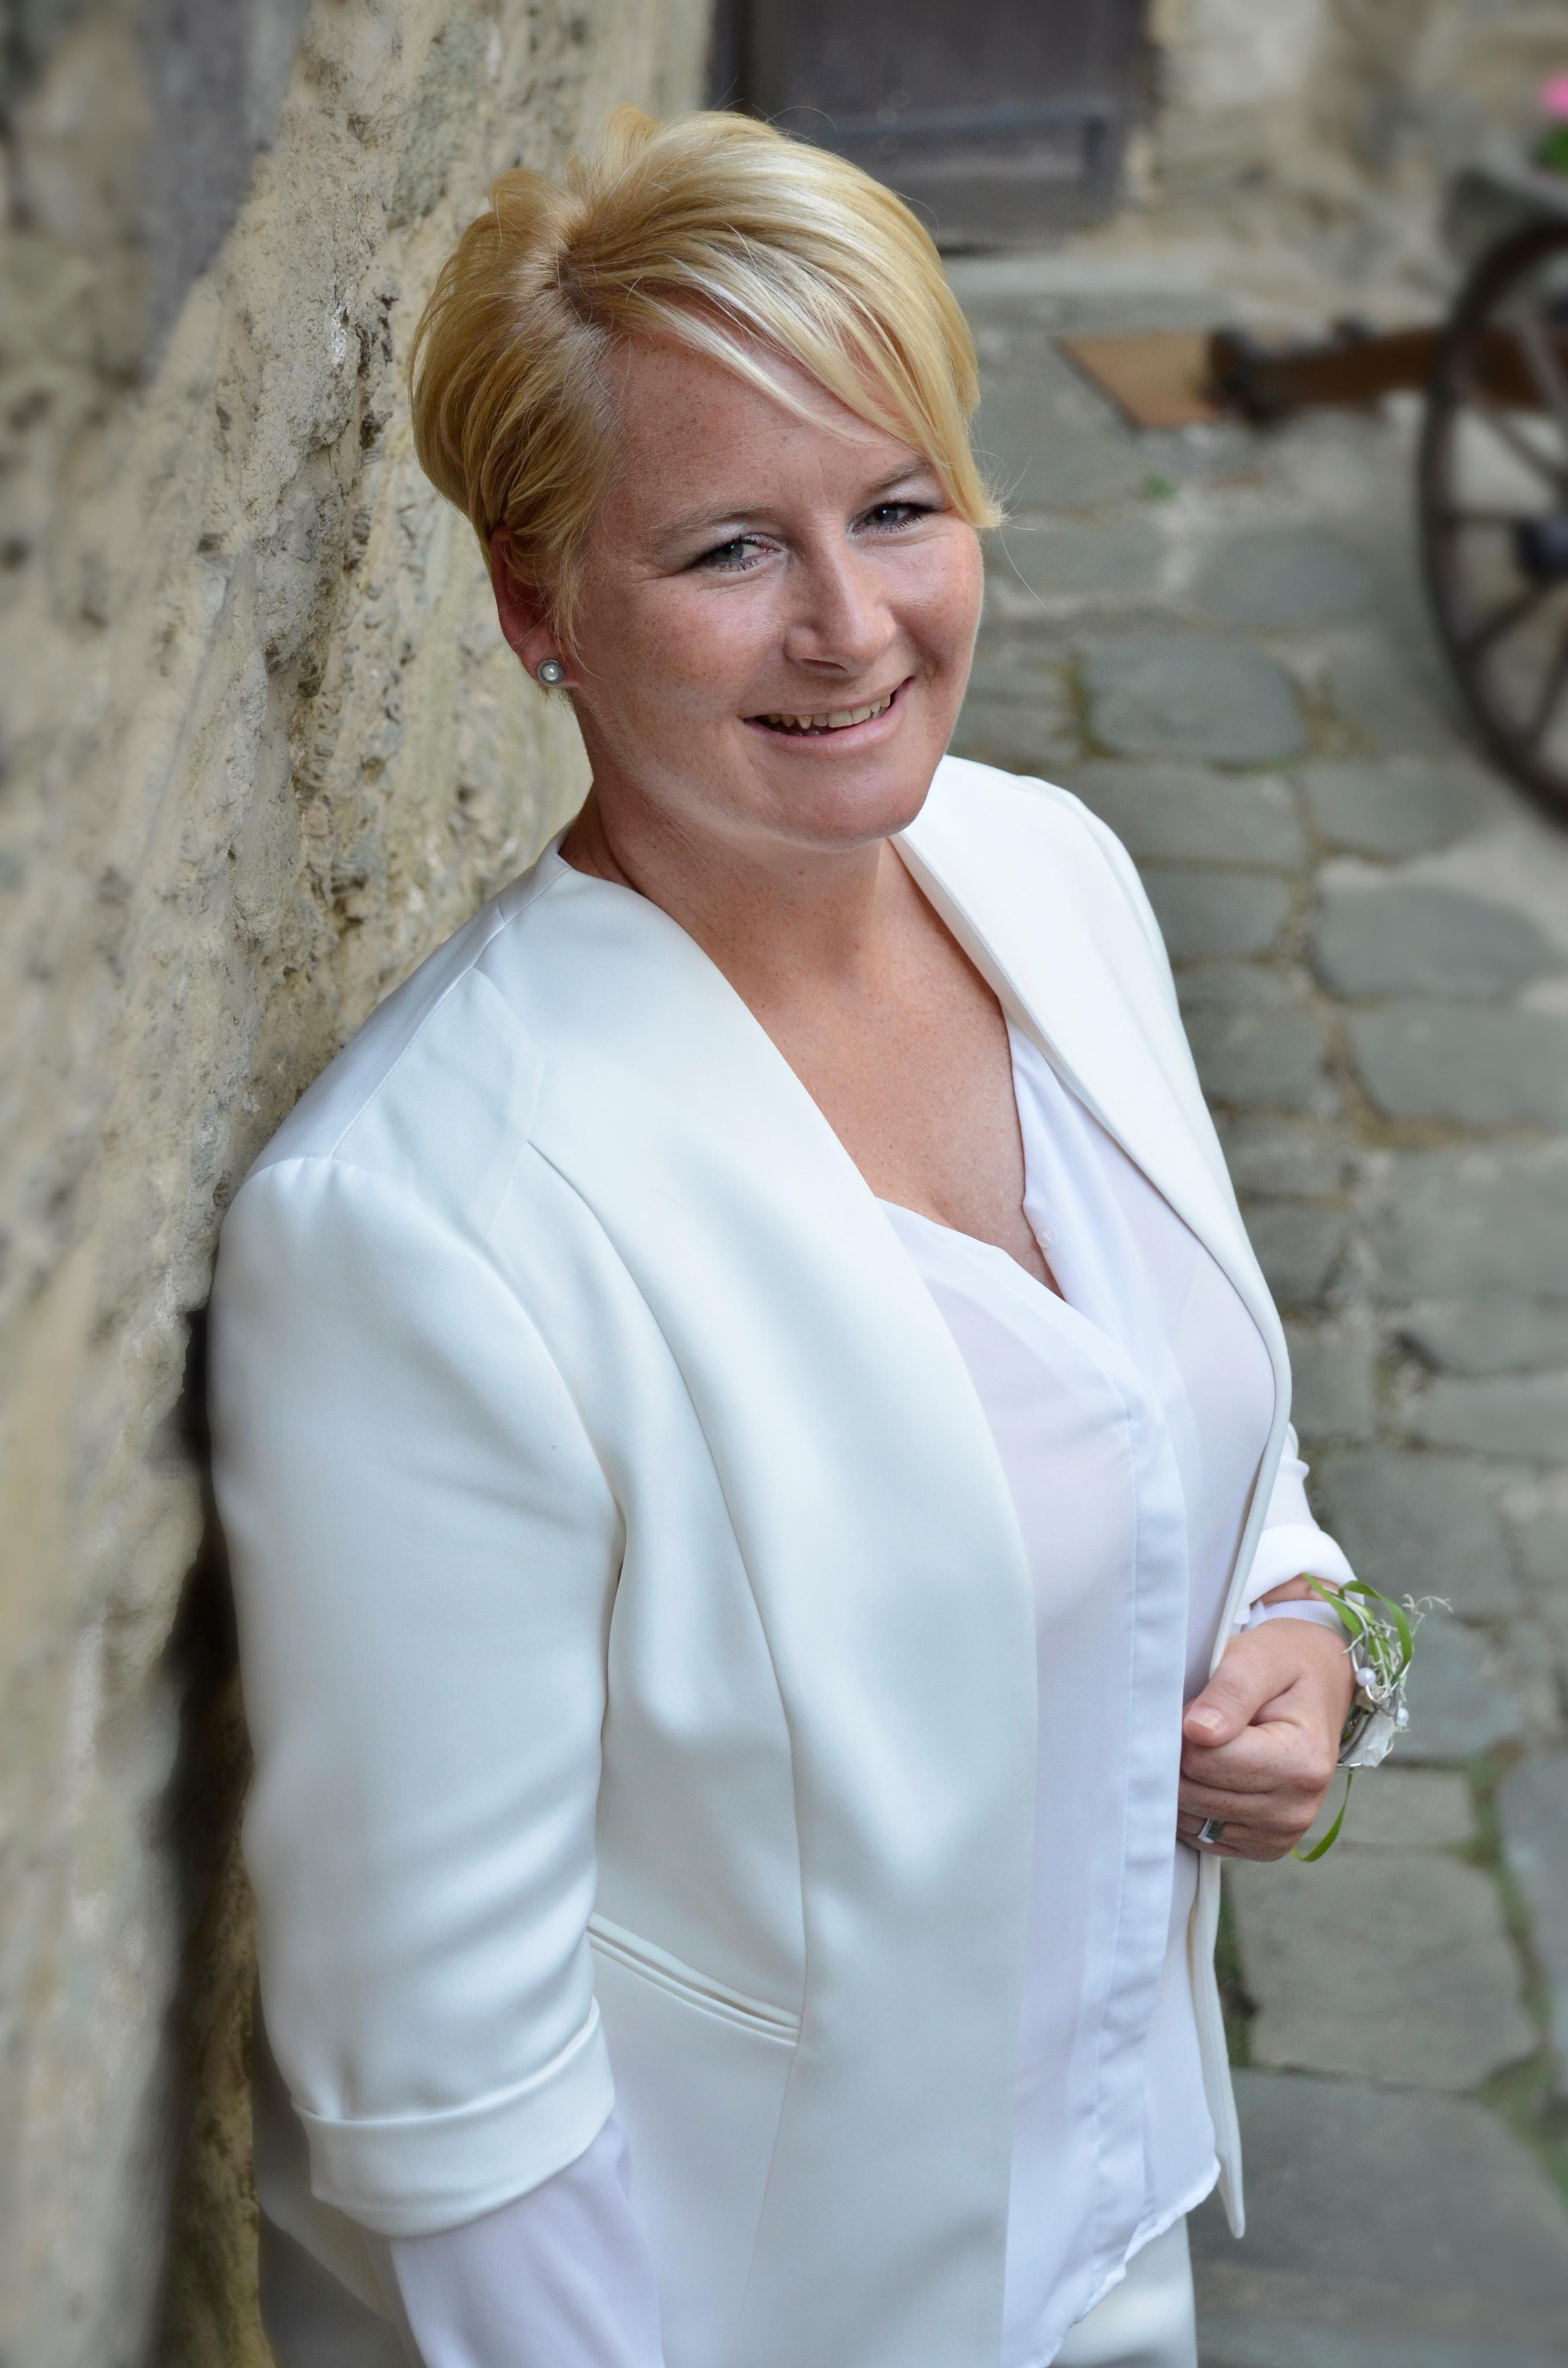 Brautanzug Helen Bender